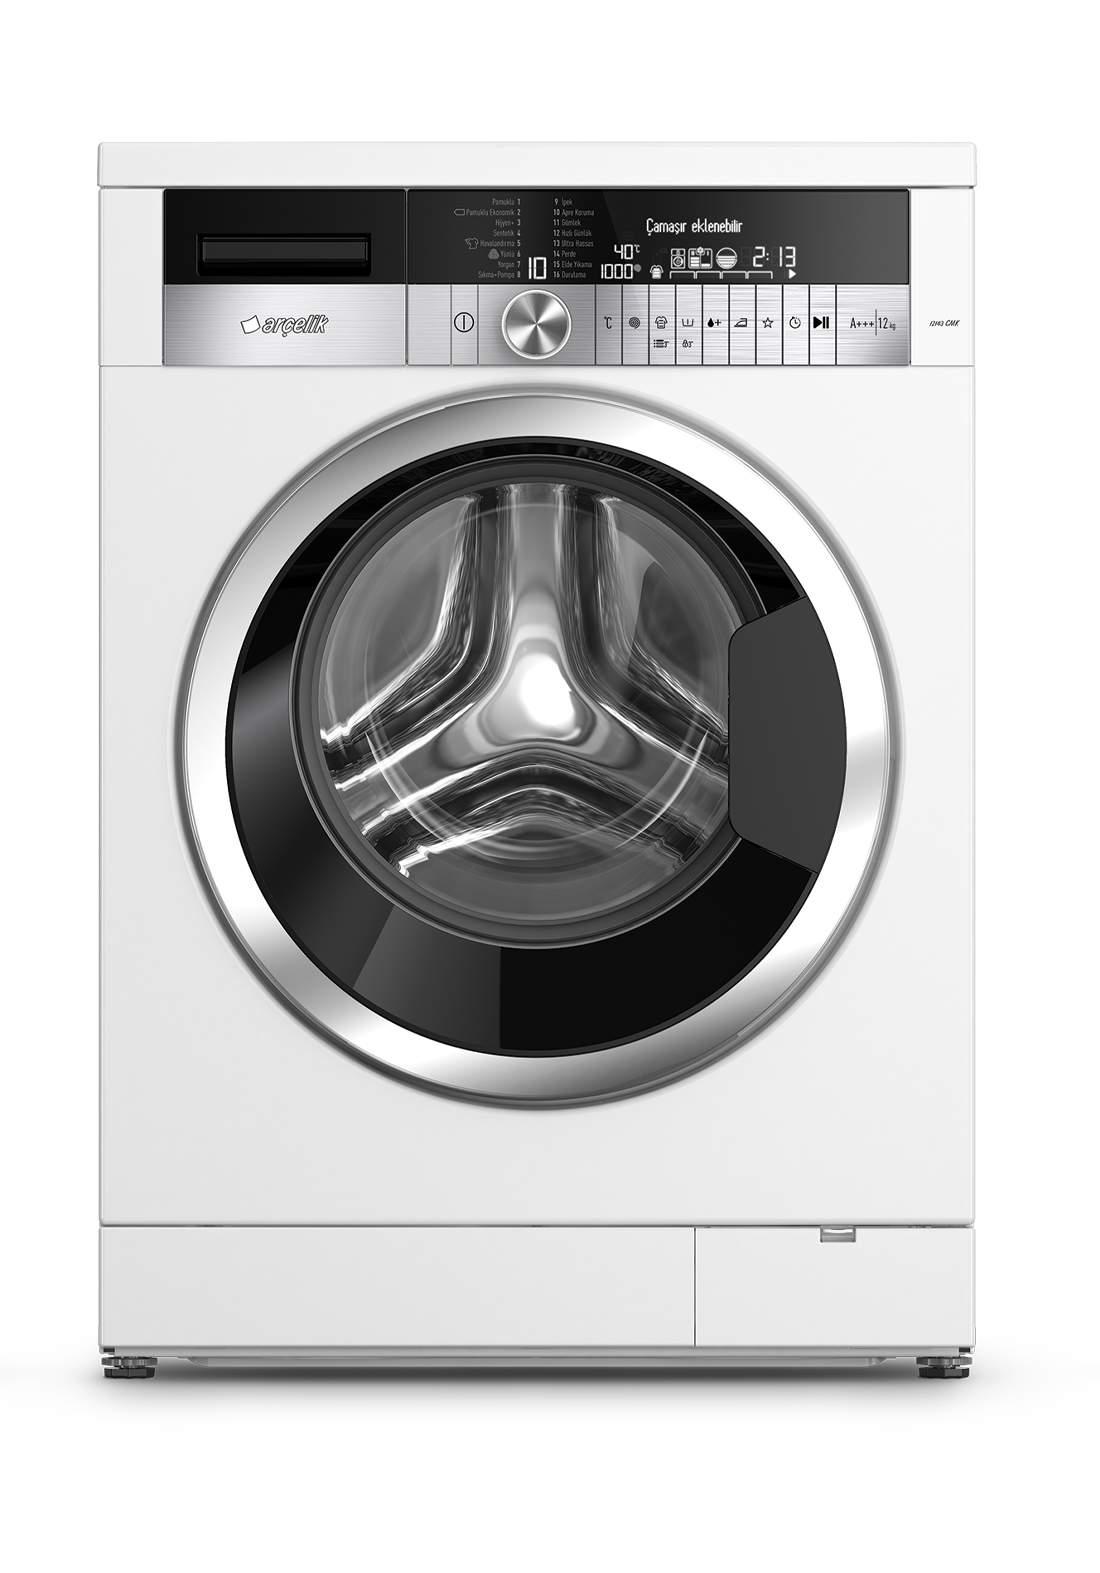 Arcelik AWN 3944 Washing machine 9 kg white غسالة 9 كيلو